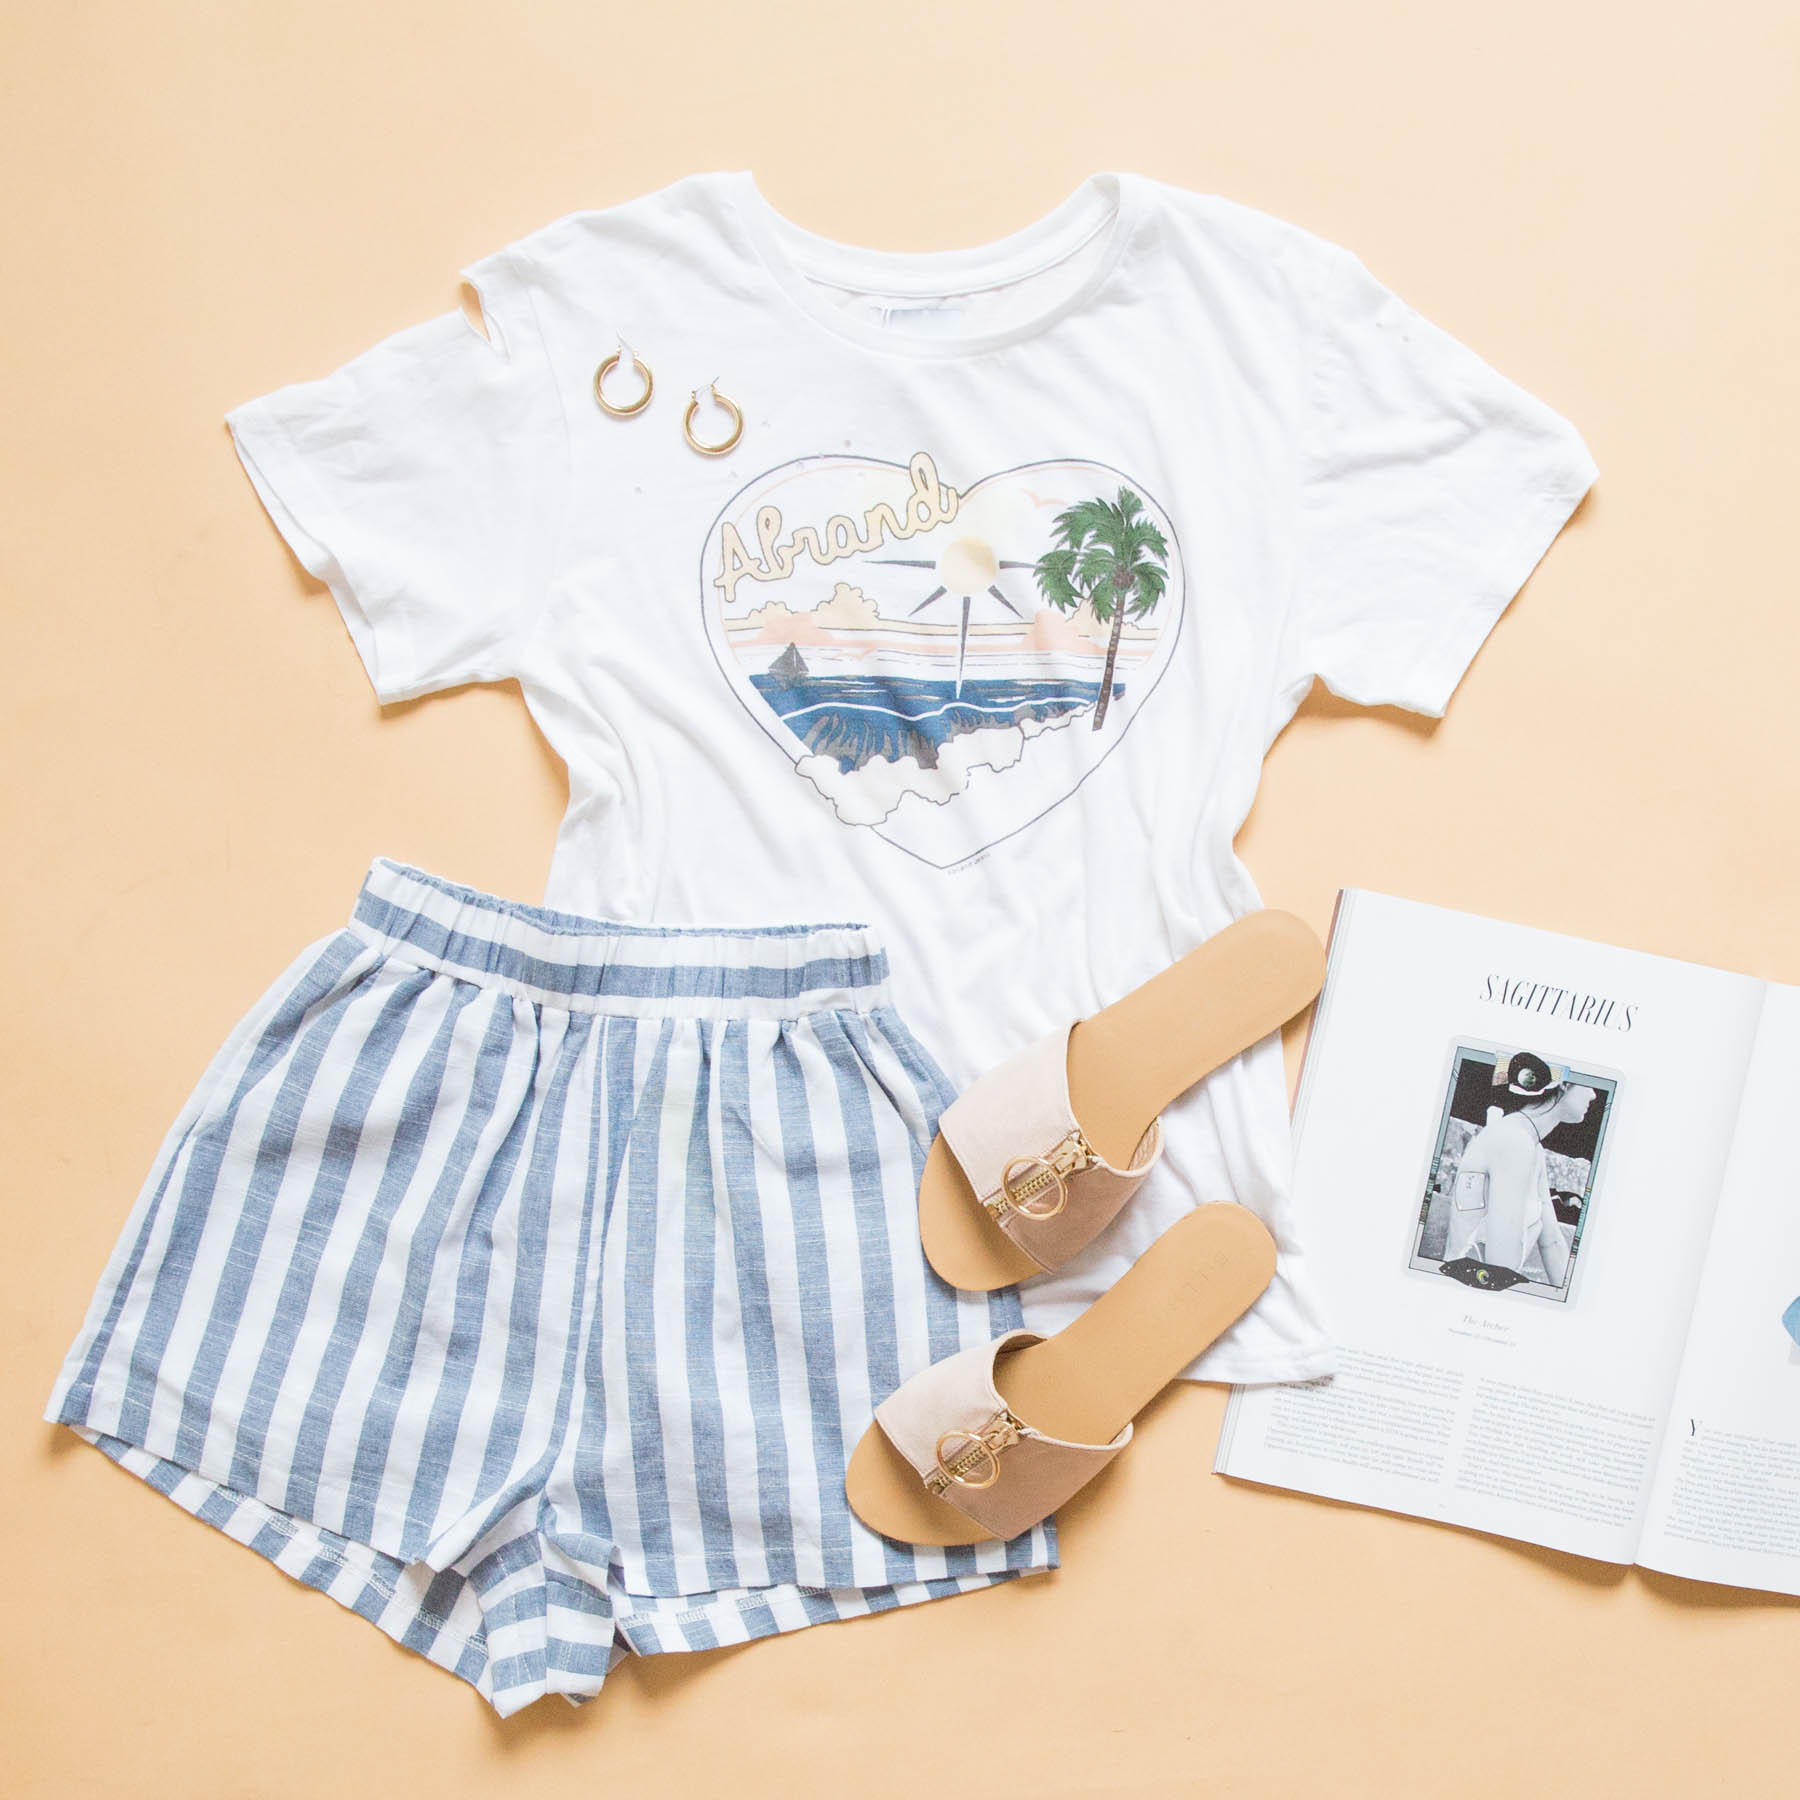 Arianna Short blue stripe, A 94 Slim Tee, mimi slide blush suede 2.jpg